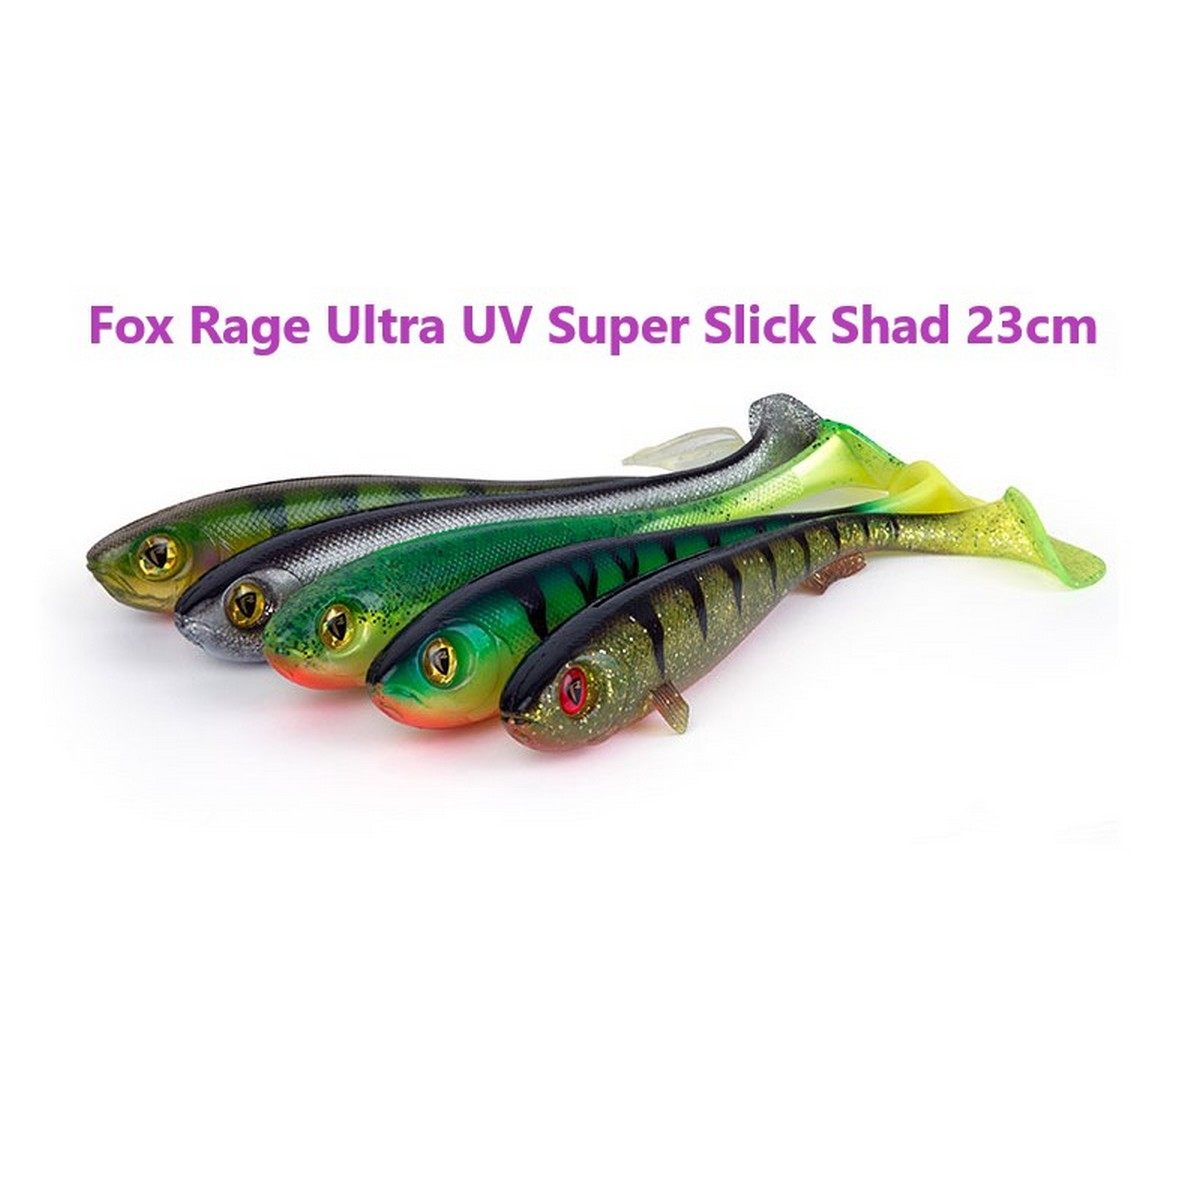 Fox Rage Ultra UV Super Slick Shad 23cm